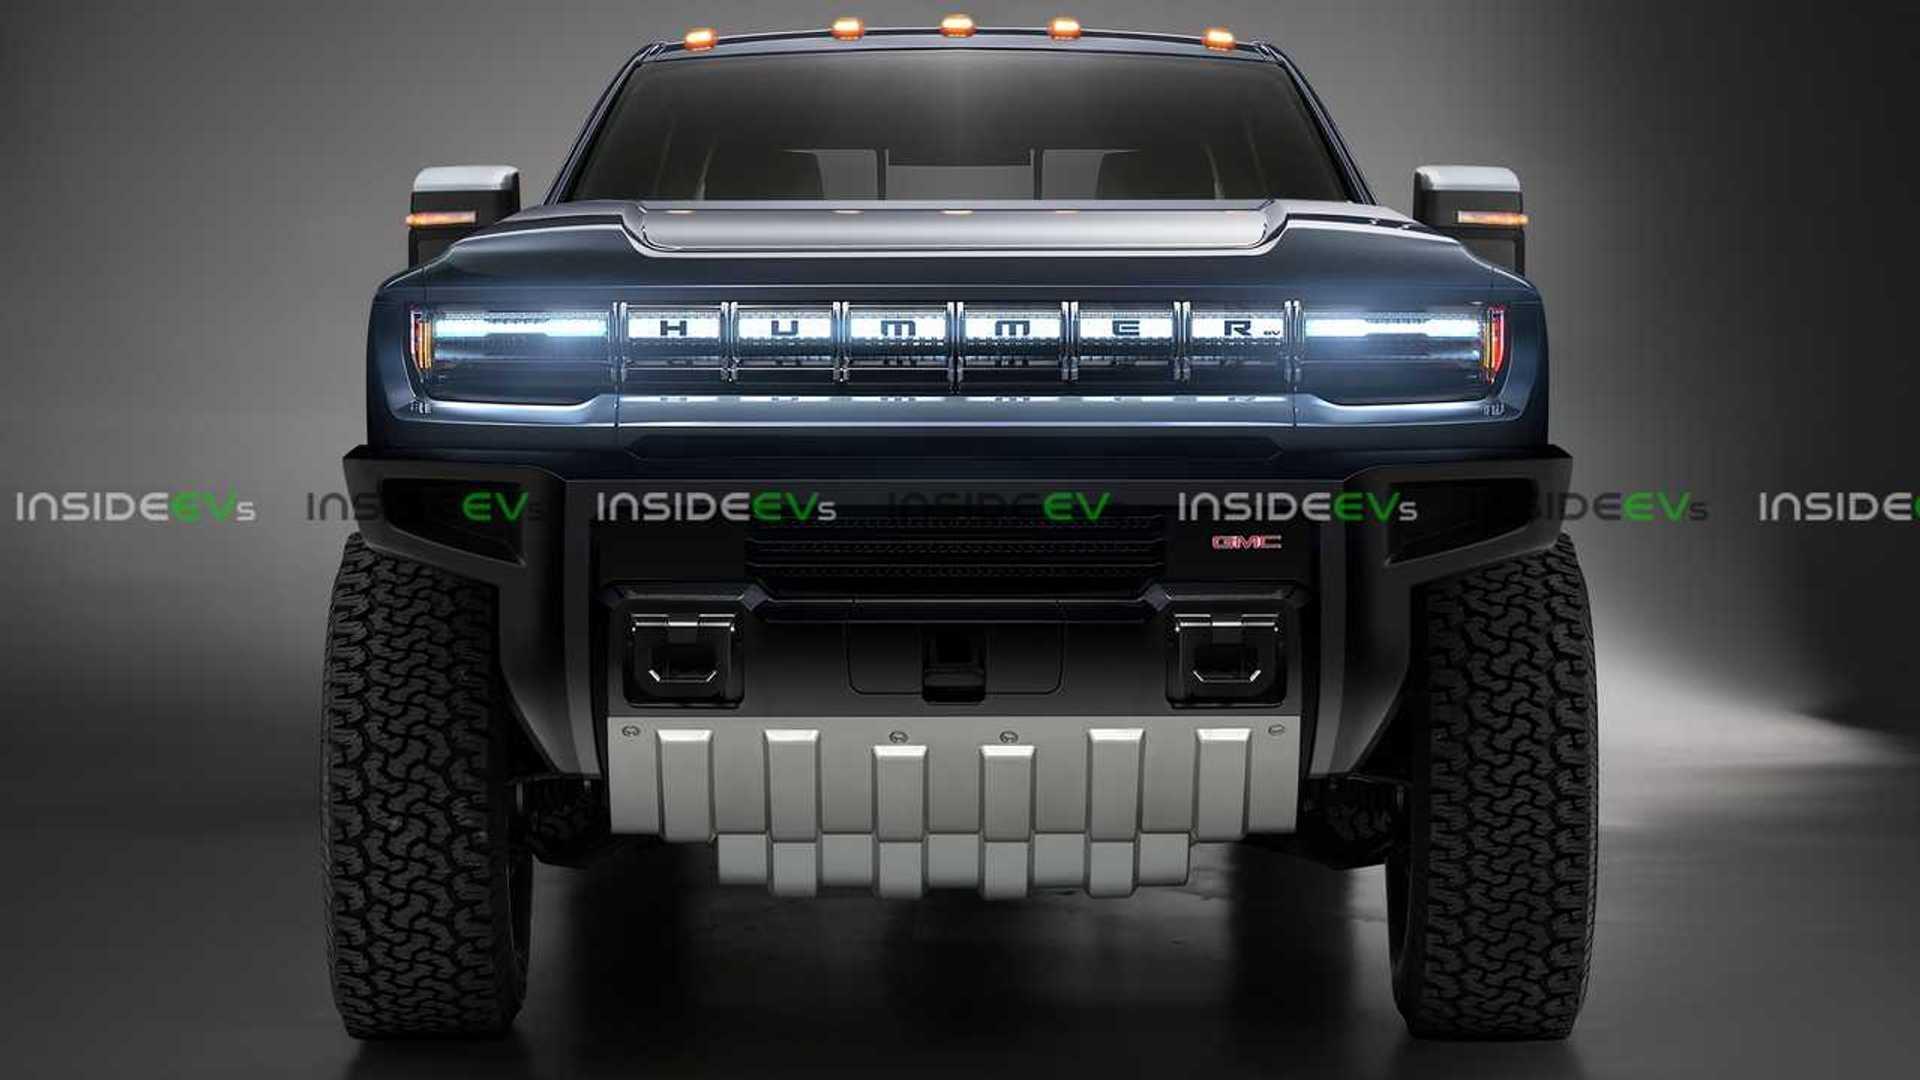 Hummer Electric Pickup Truck Vs Tesla Cybertruck: Survey ...